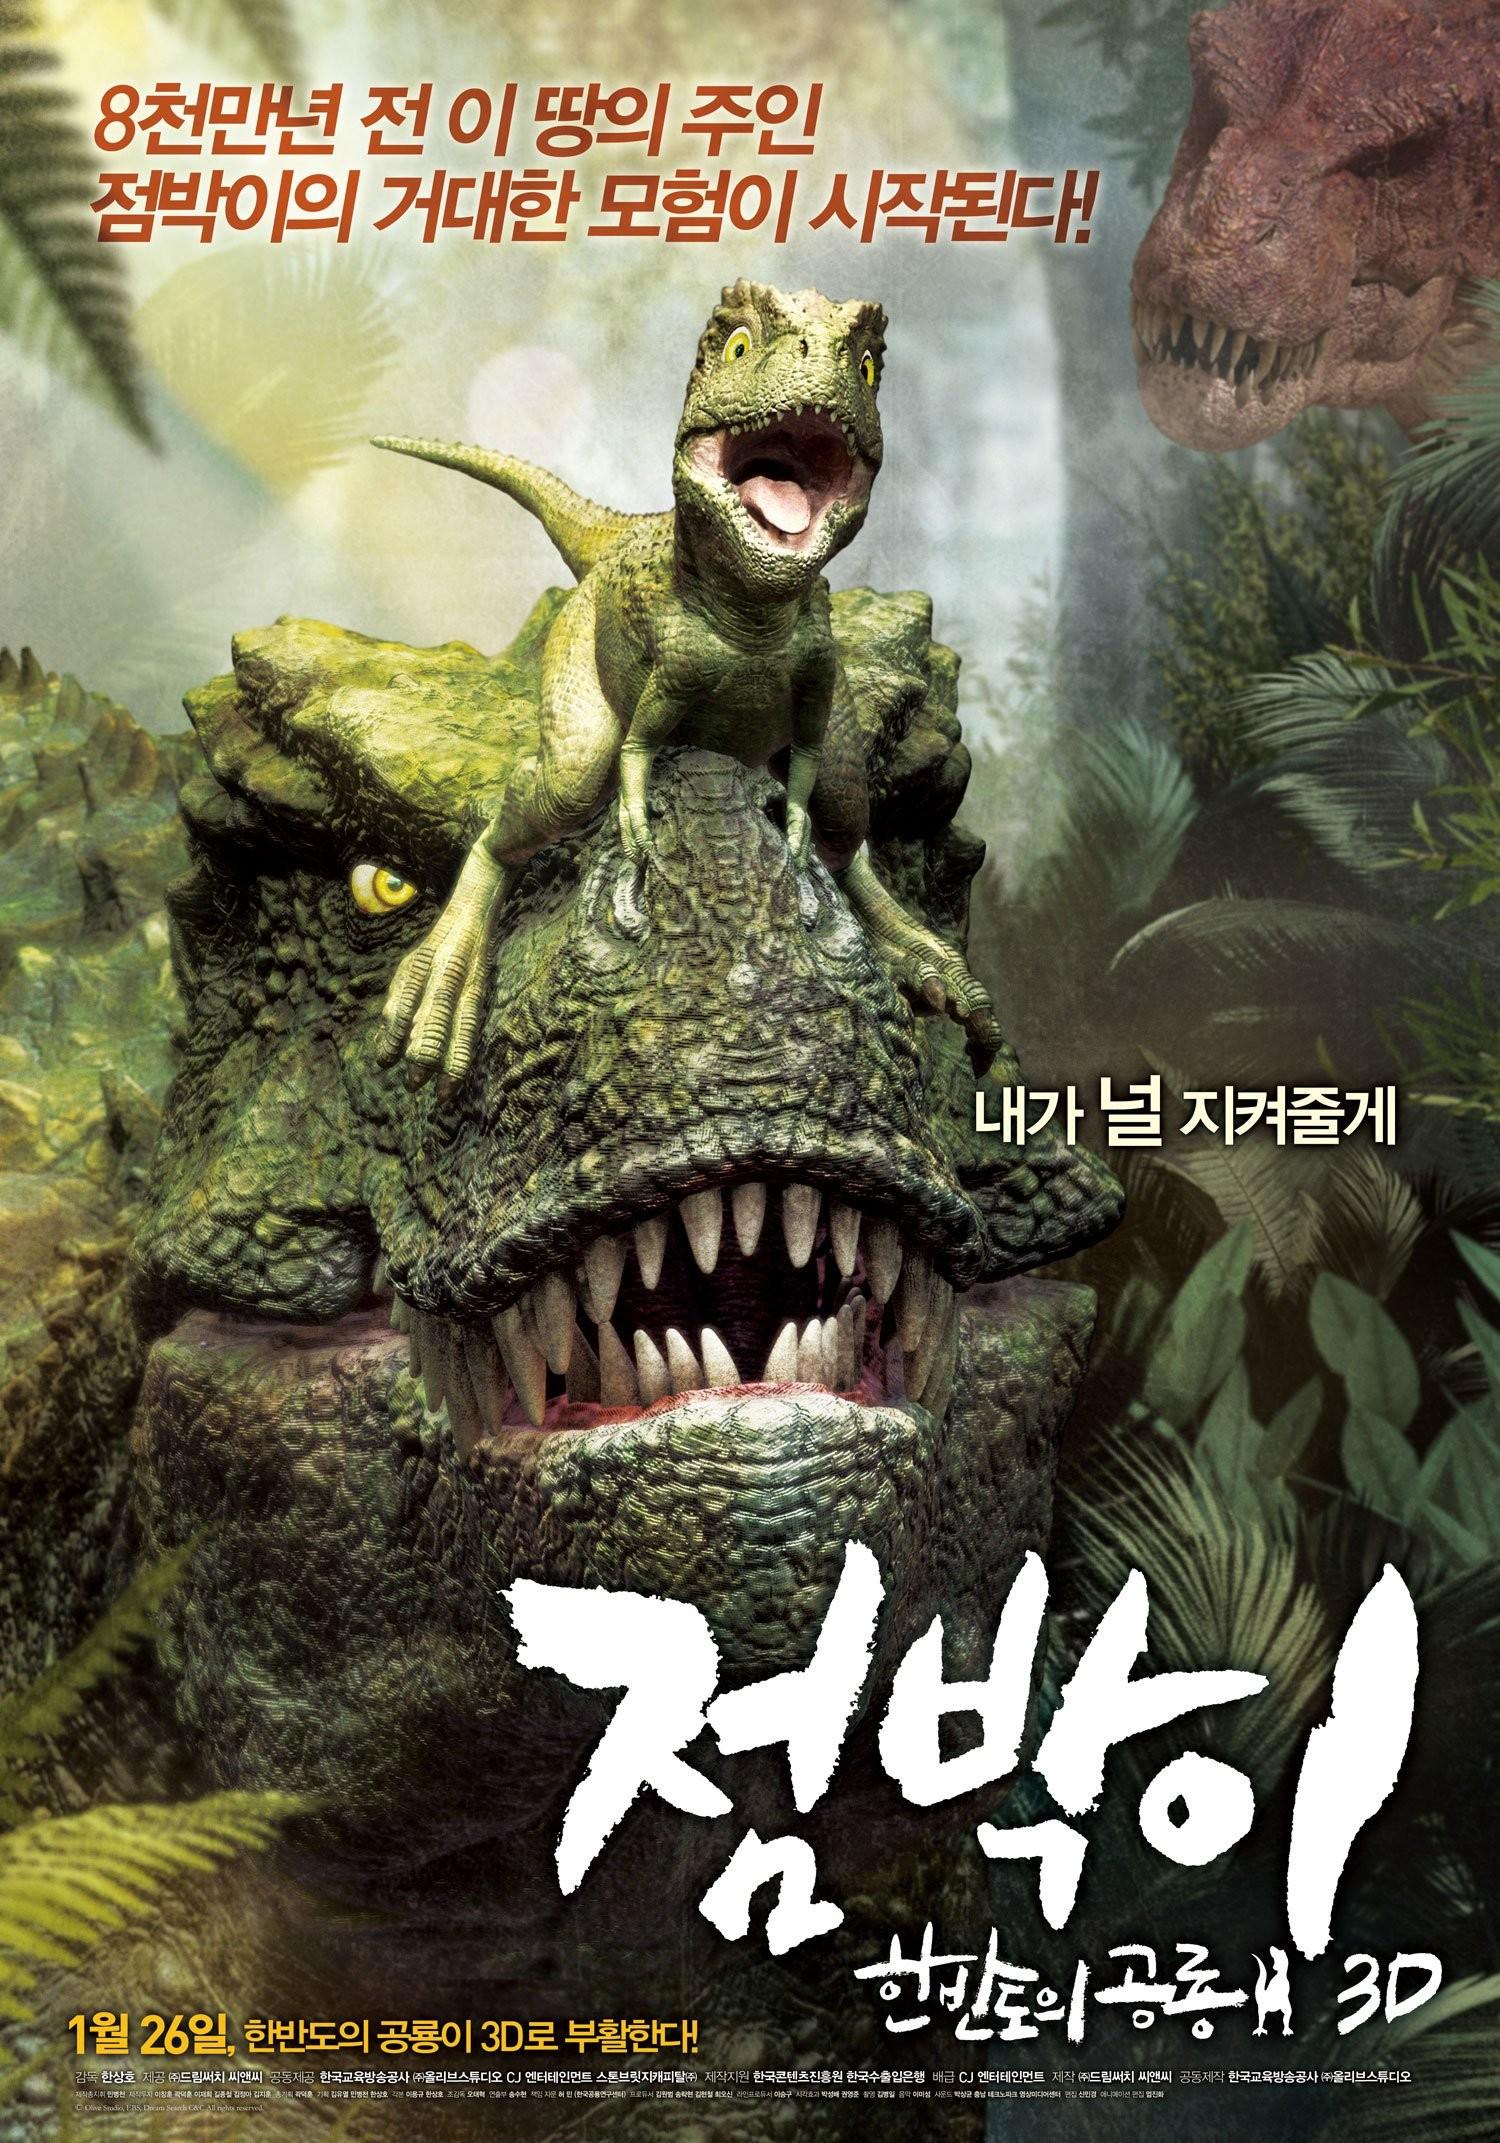 плакат фильма постер Тарбозавр 3D